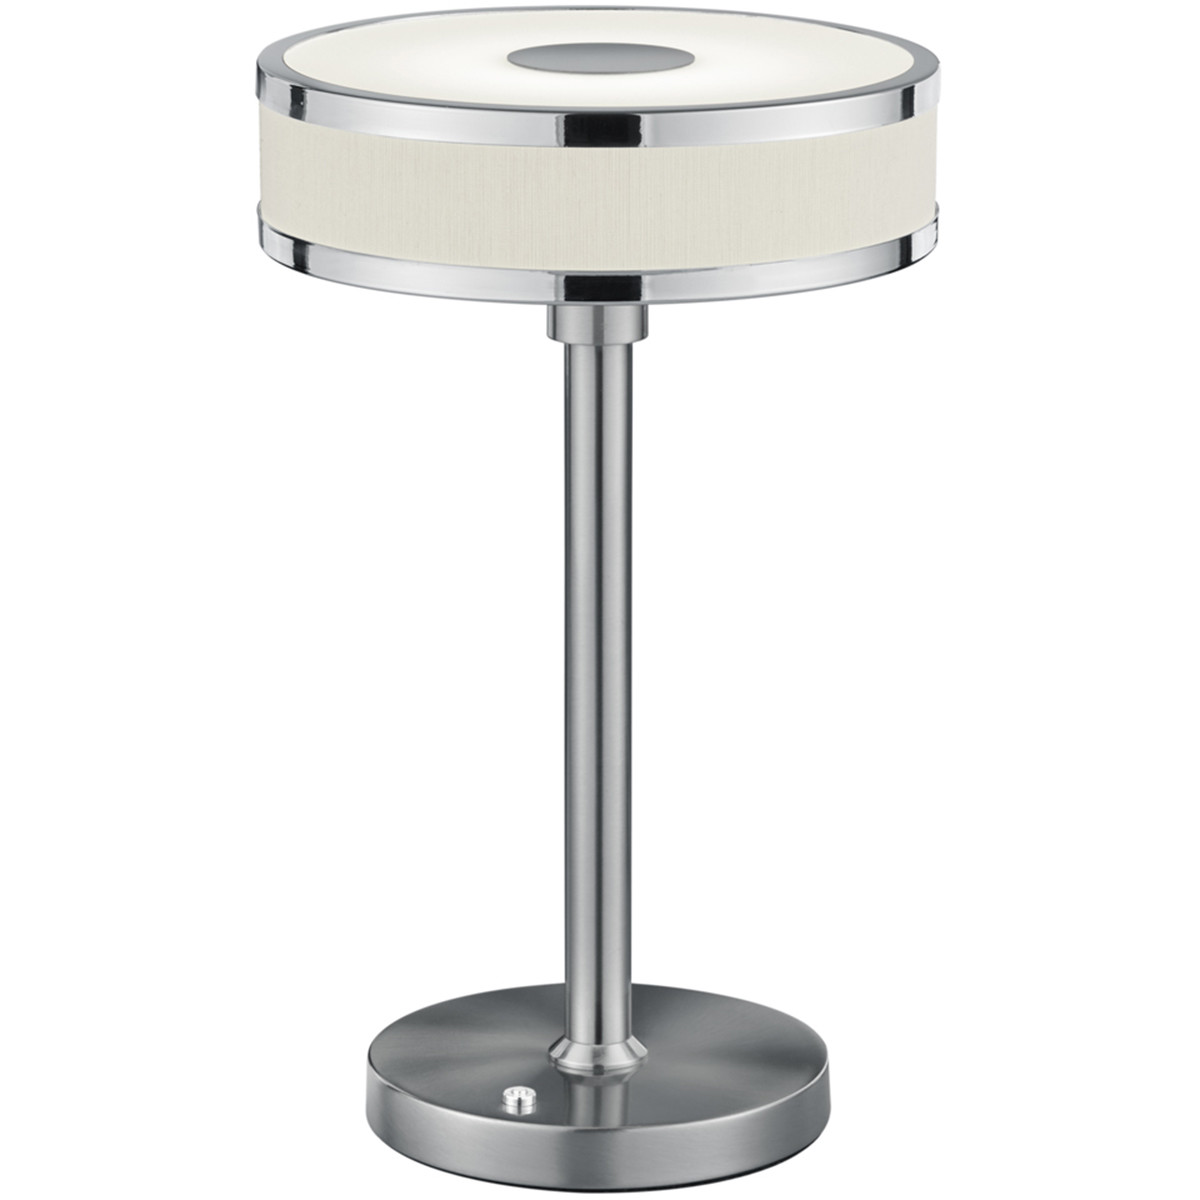 LED Tafellamp - Trion Agiany - 7W - Warm Wit 3000K - Dimbaar - Rond - Mat Nikkel - Aluminium